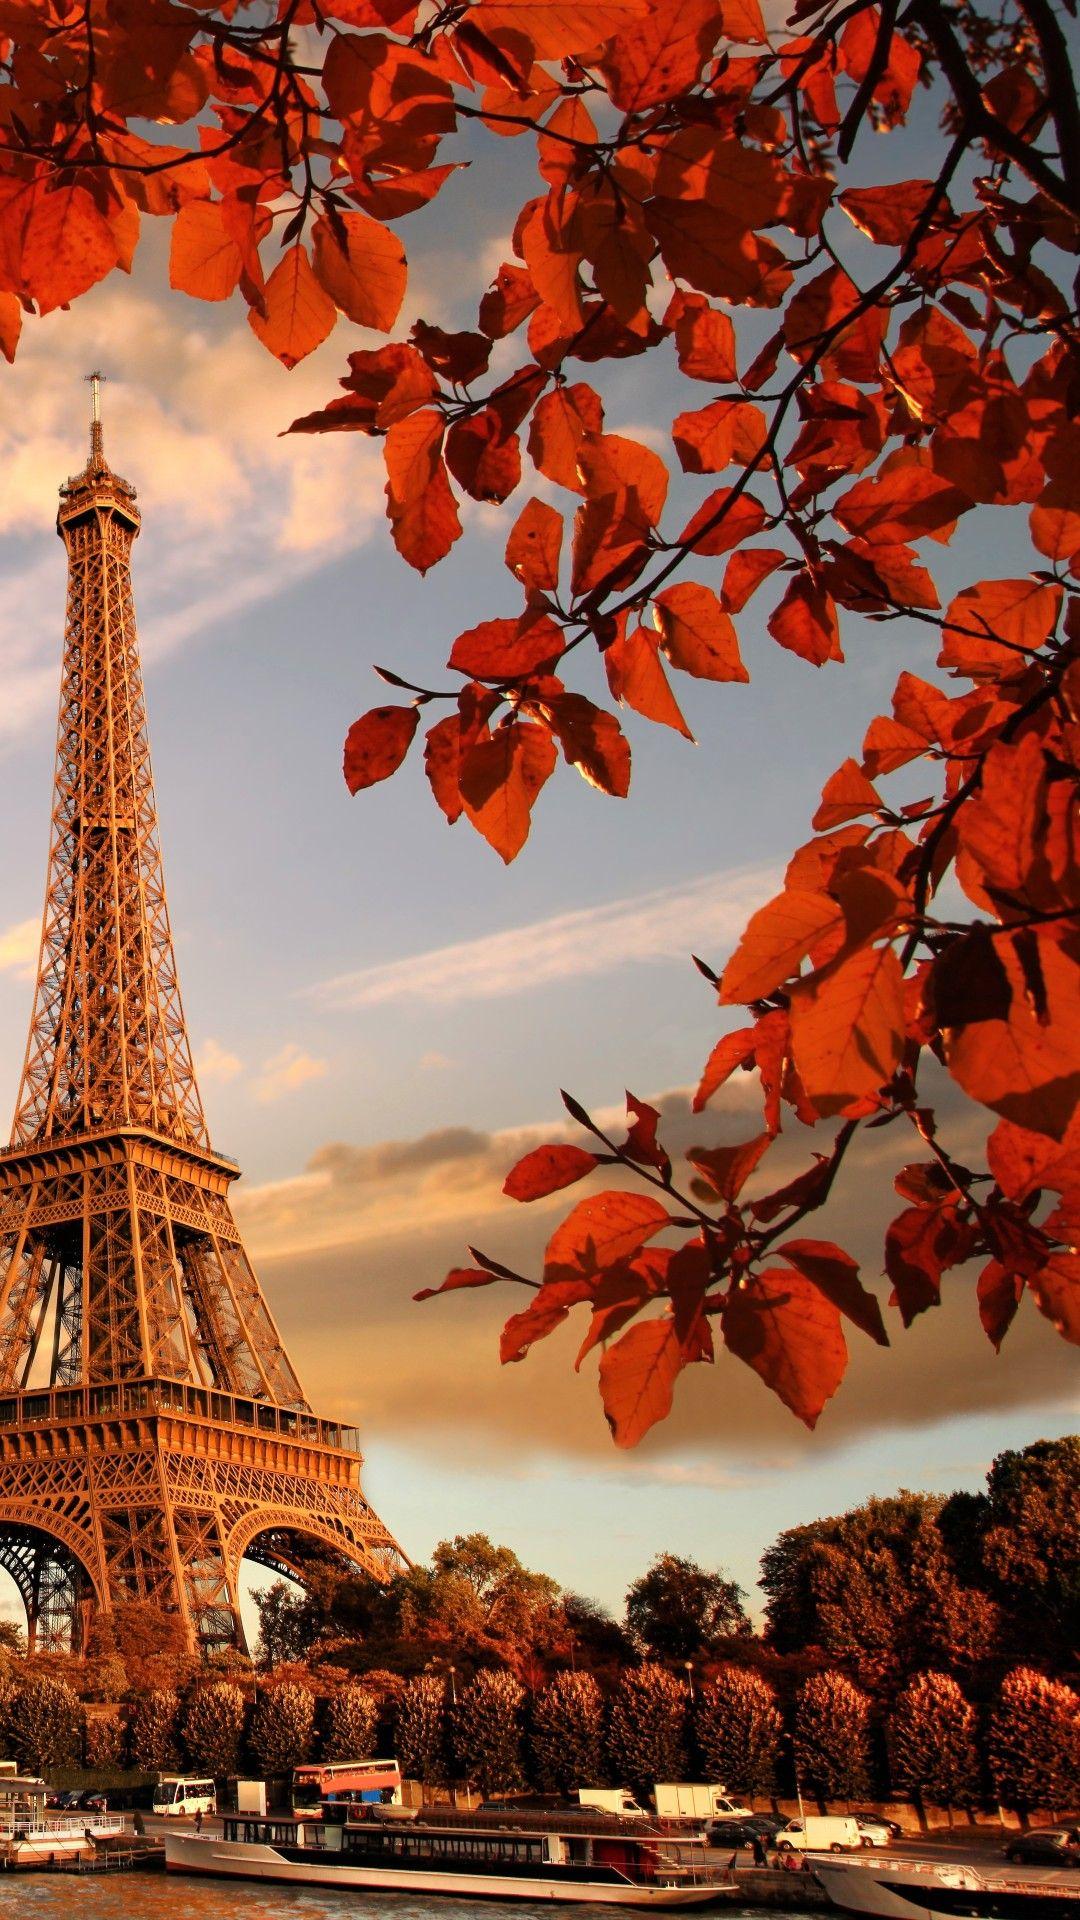 Free Download Eiffel Tower In Autumn France Paris Apple Iphone 6 Hd Wallpapers 1080x1920 For Your Desktop Mobile Tablet Explore 32 Paris City Wallpapers Paris City Wallpapers Wallpaper Of